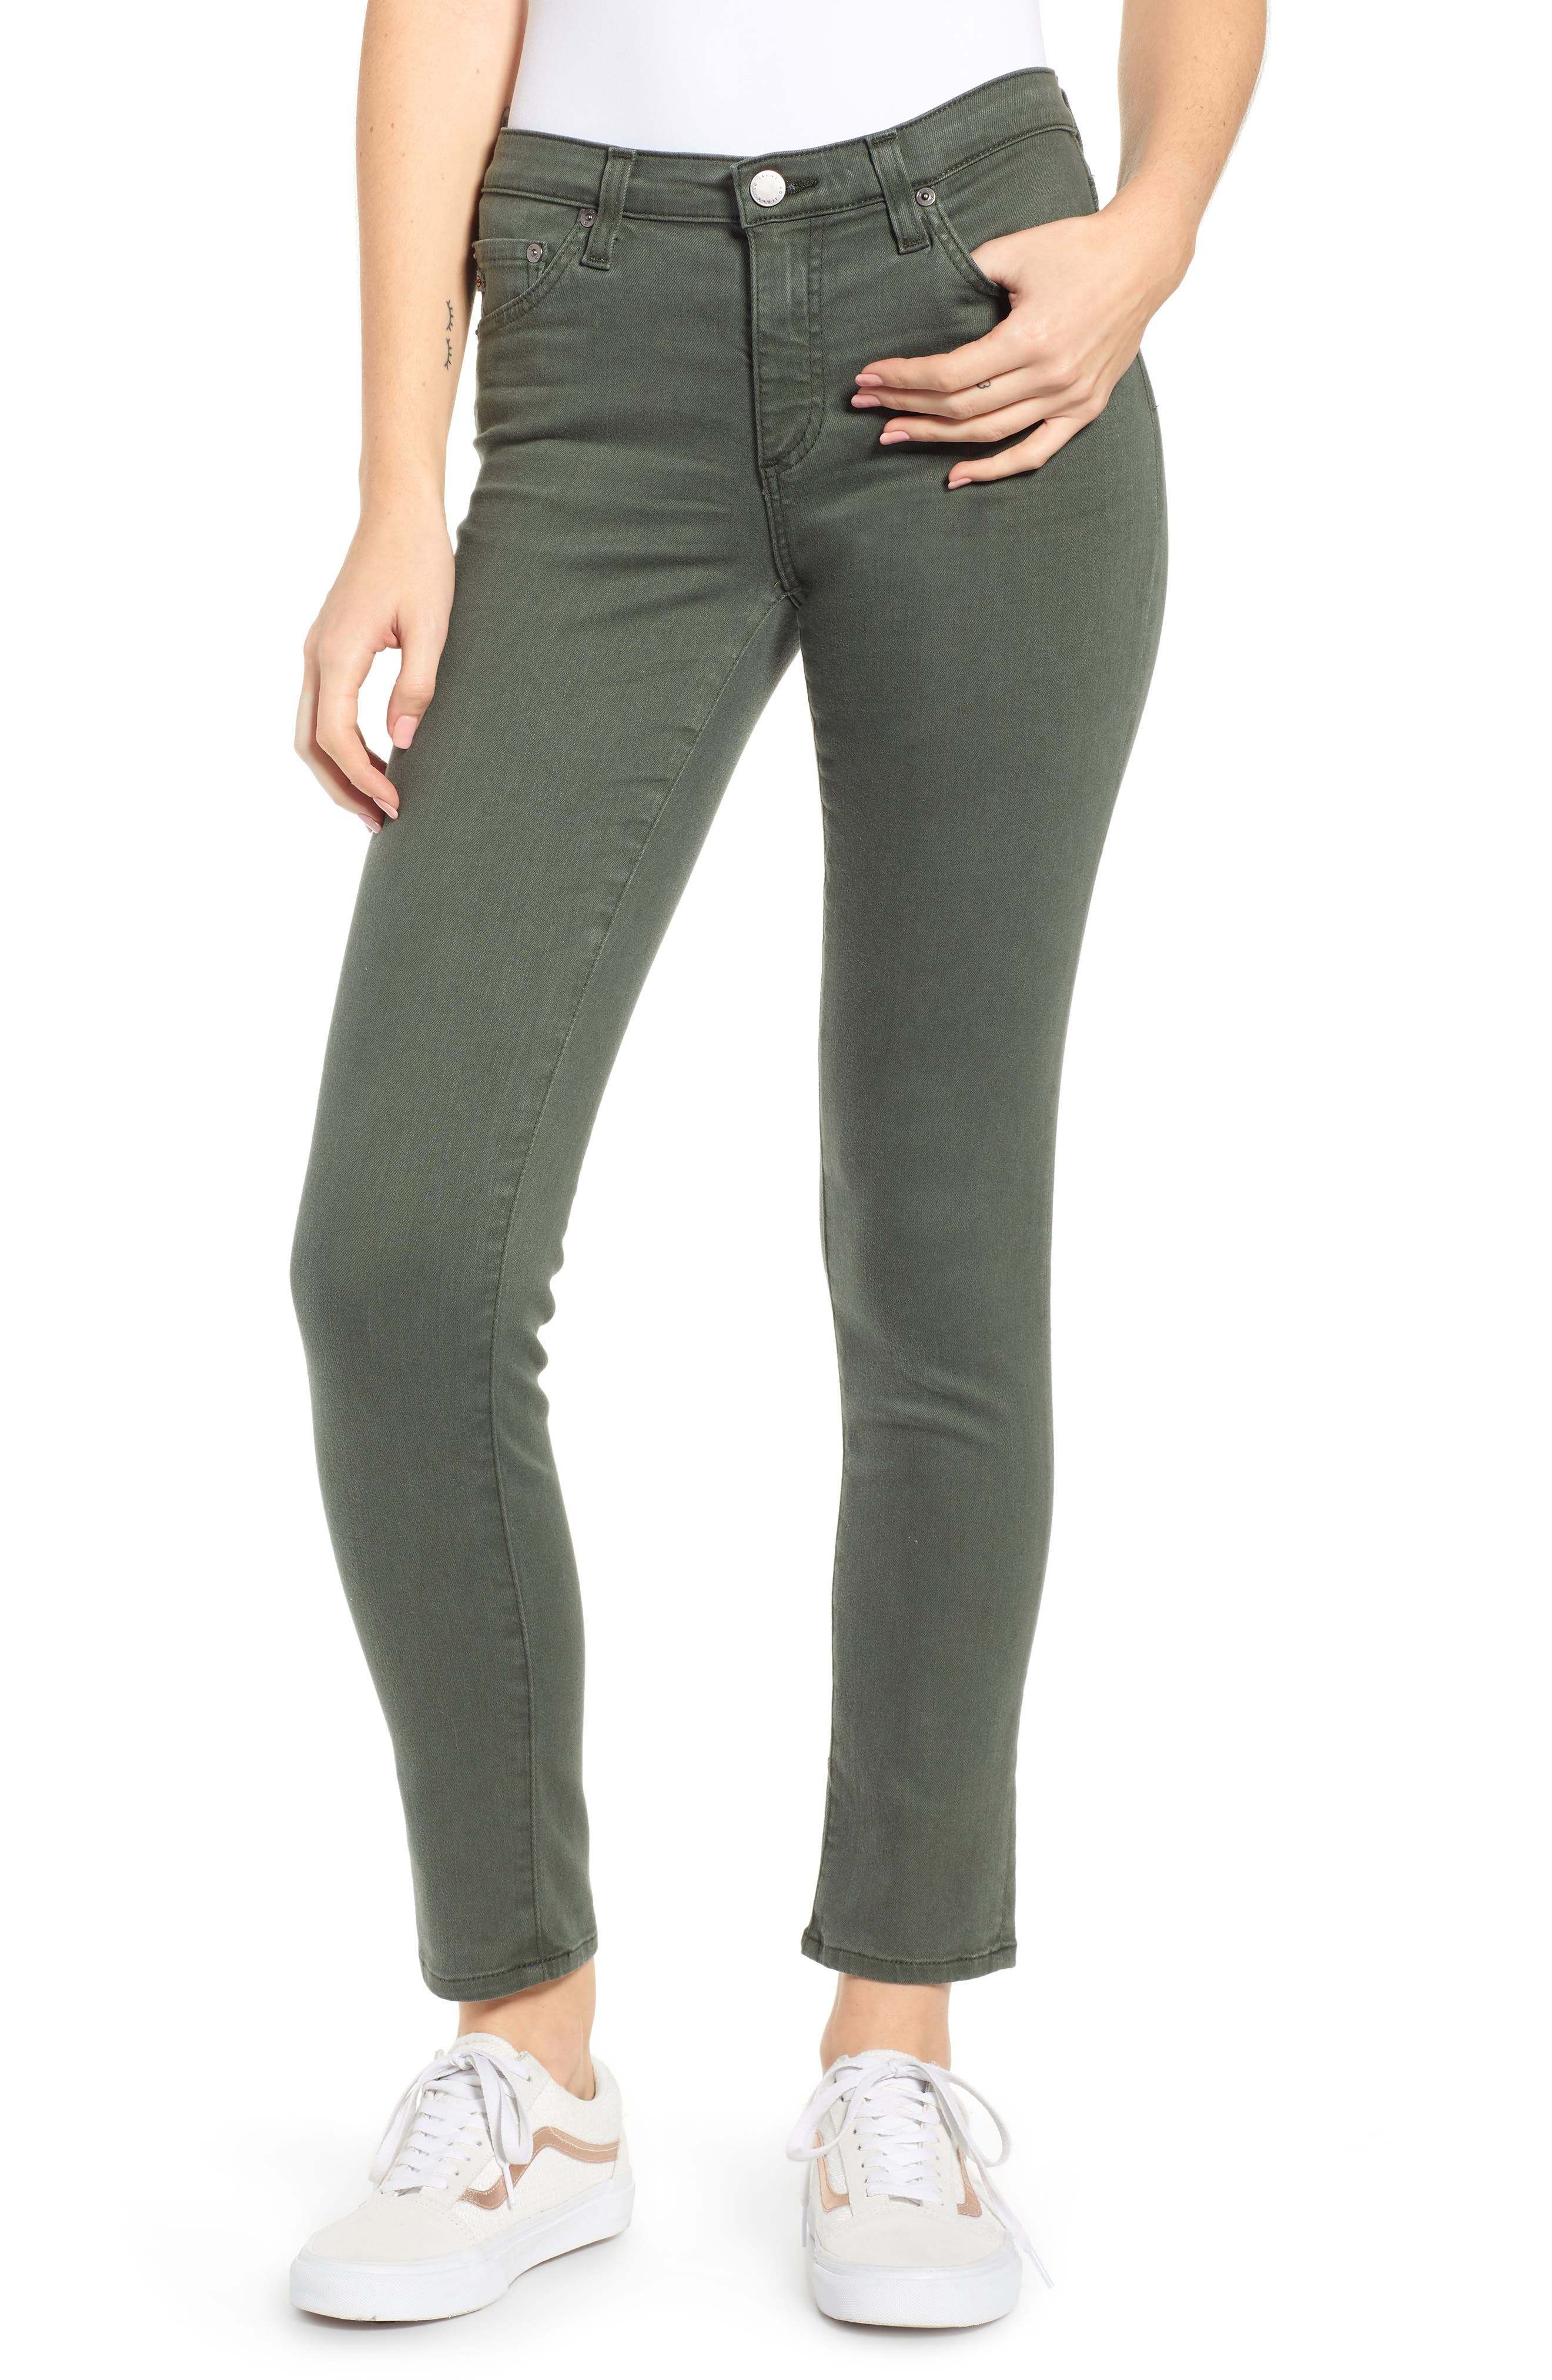 AG The Prima Ankle Cigarette Jeans, Main, color, 01Y SULFUR ASH GREEN